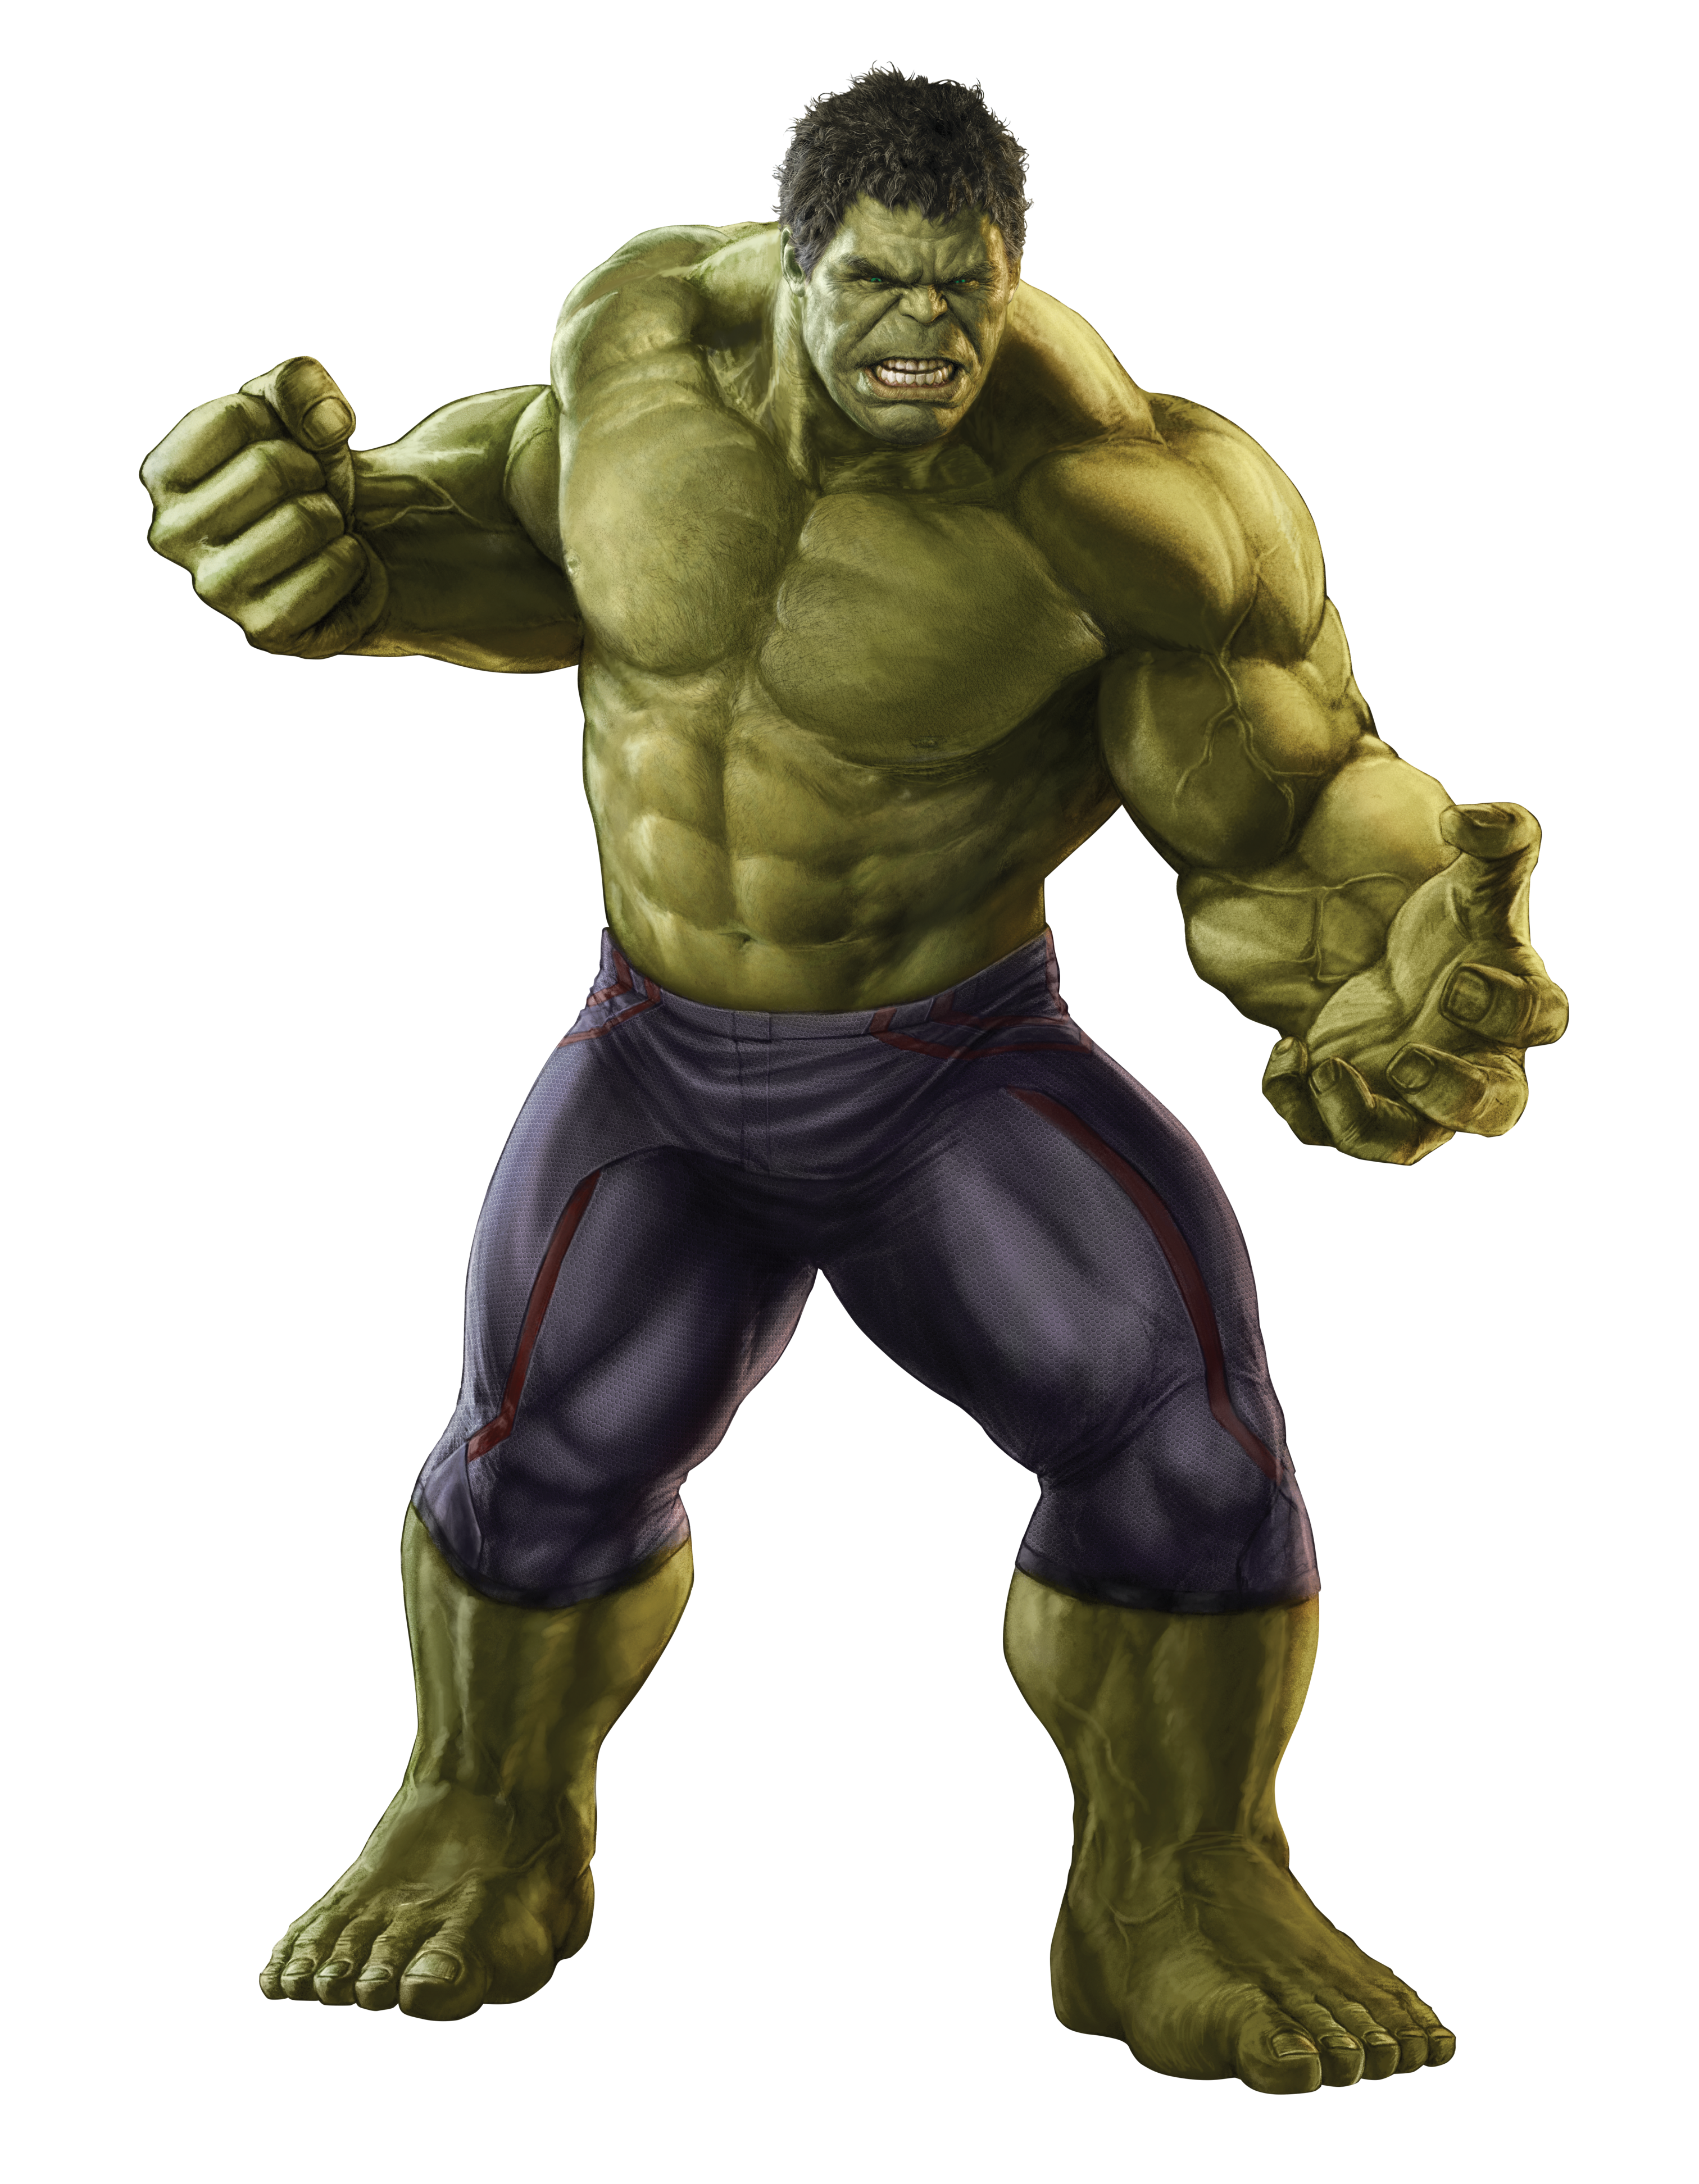 Clipart hands incredible hulk. October ksimpson th